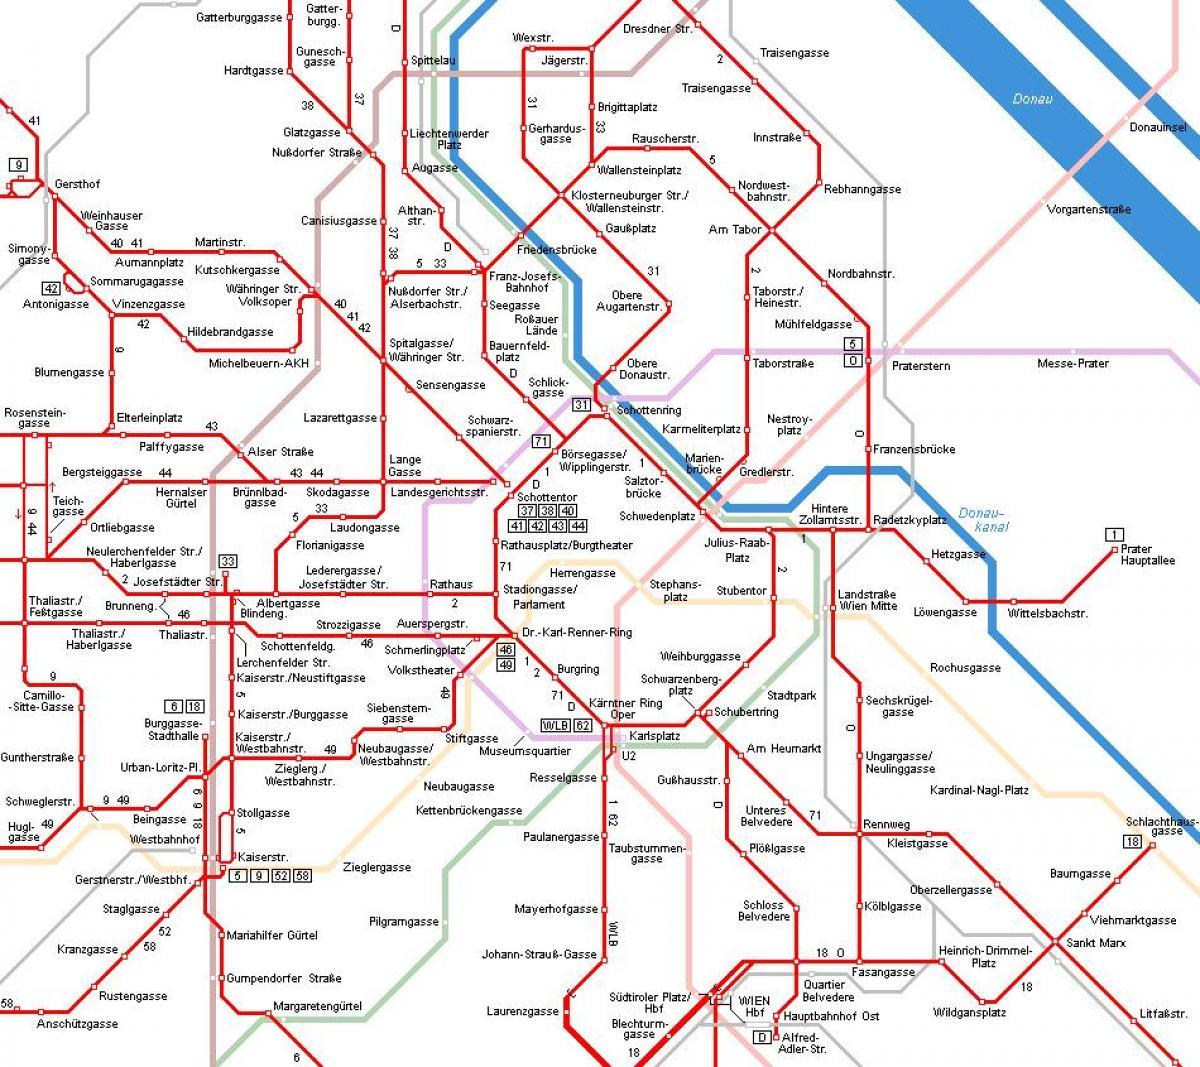 Vienna Tram Subway Map.Vienna Tram D Map Vienna Austria Tram Map Austria